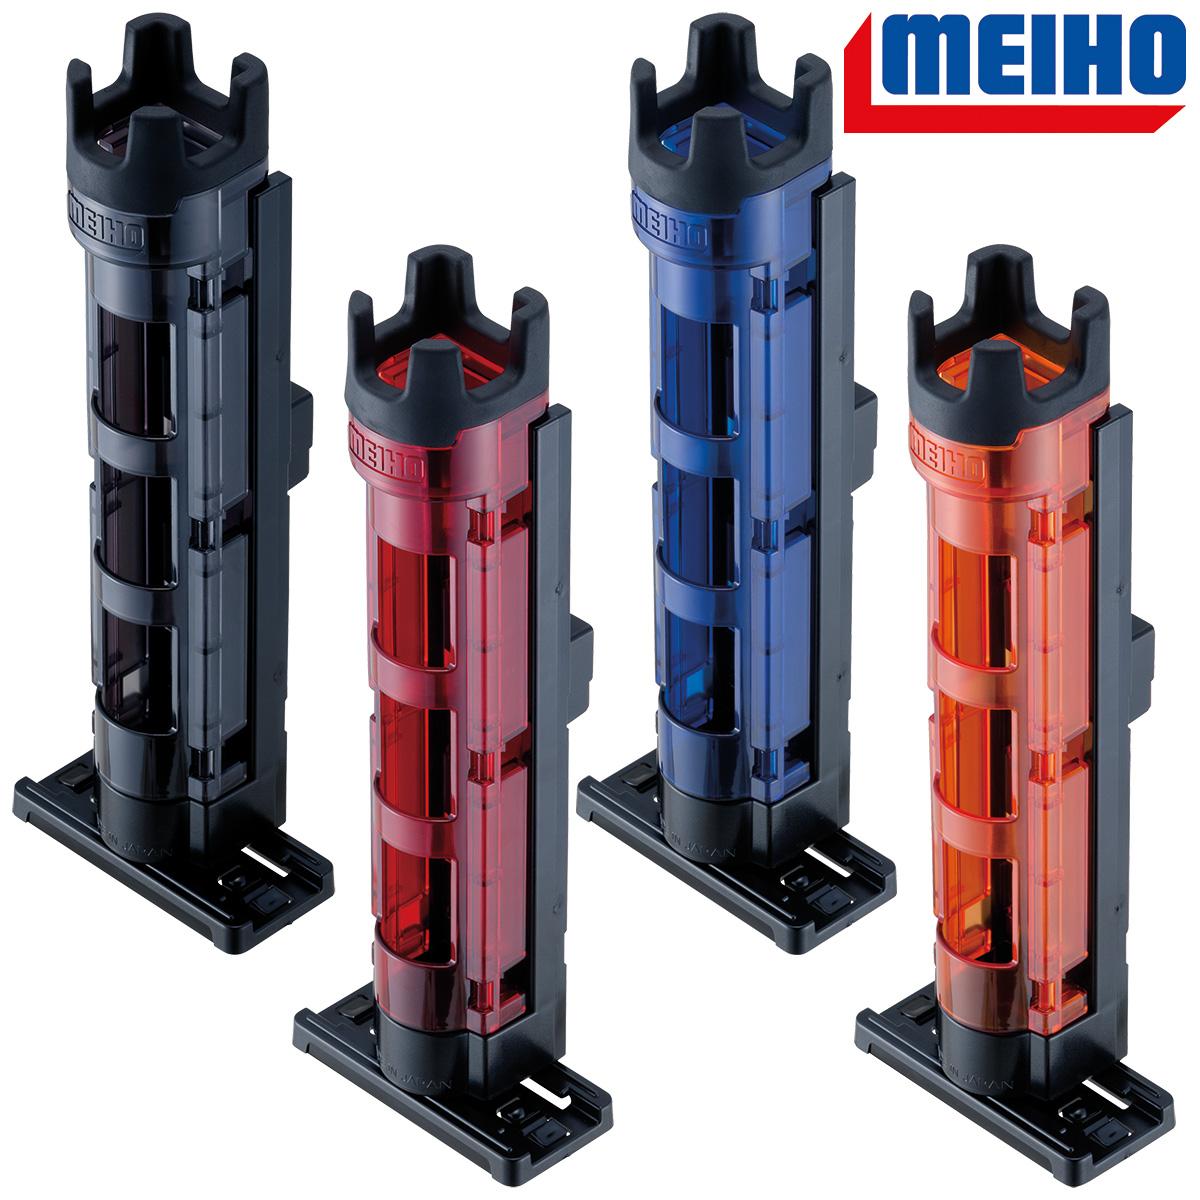 MEIHO BM-250 Light Rutenhalter Farbauswahl